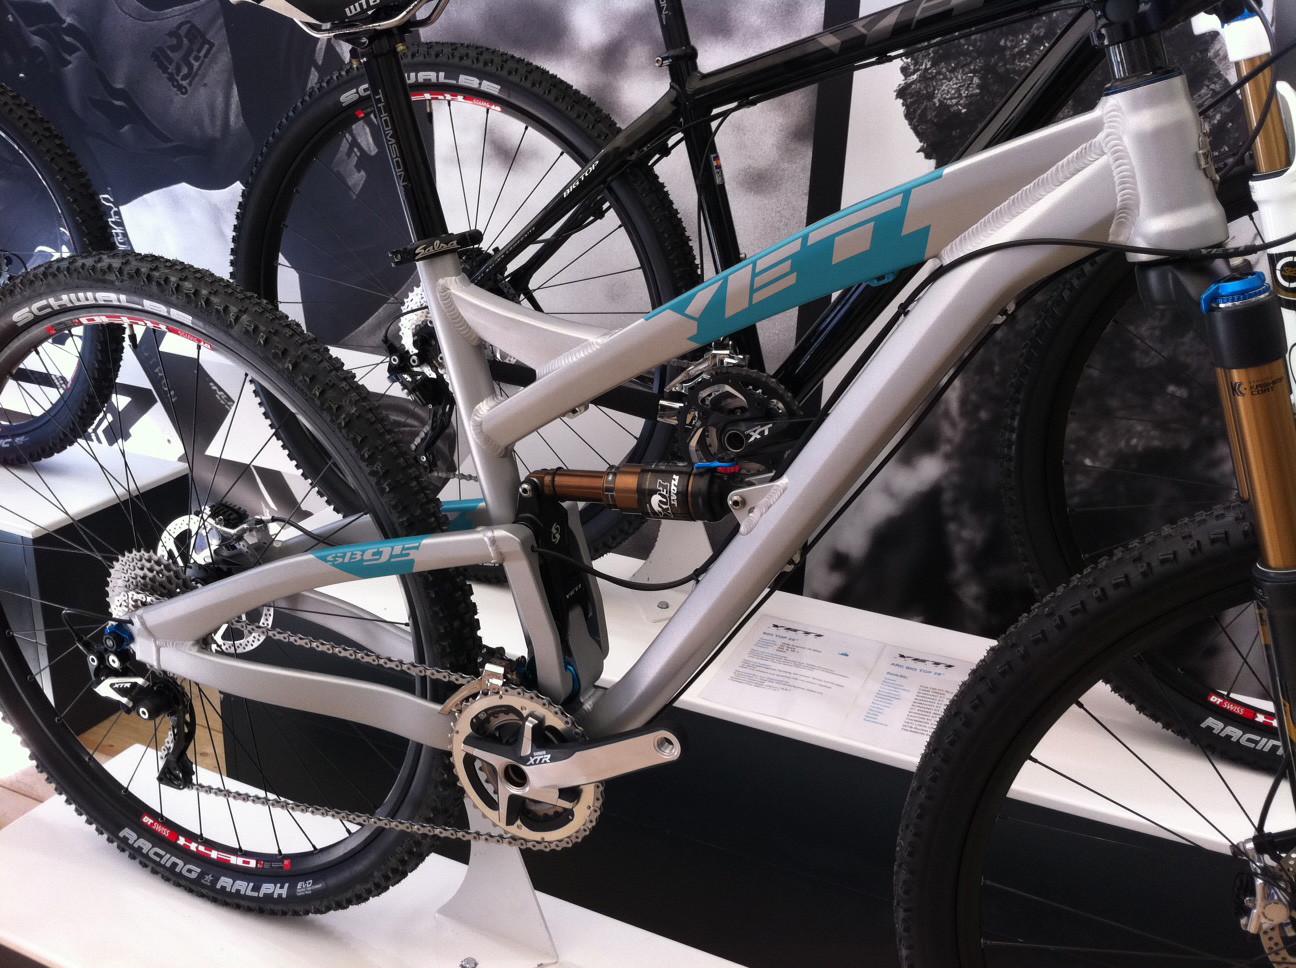 Yeti SB-95 - Eurobike 2011 - Mountain Biking Pictures - Vital MTB